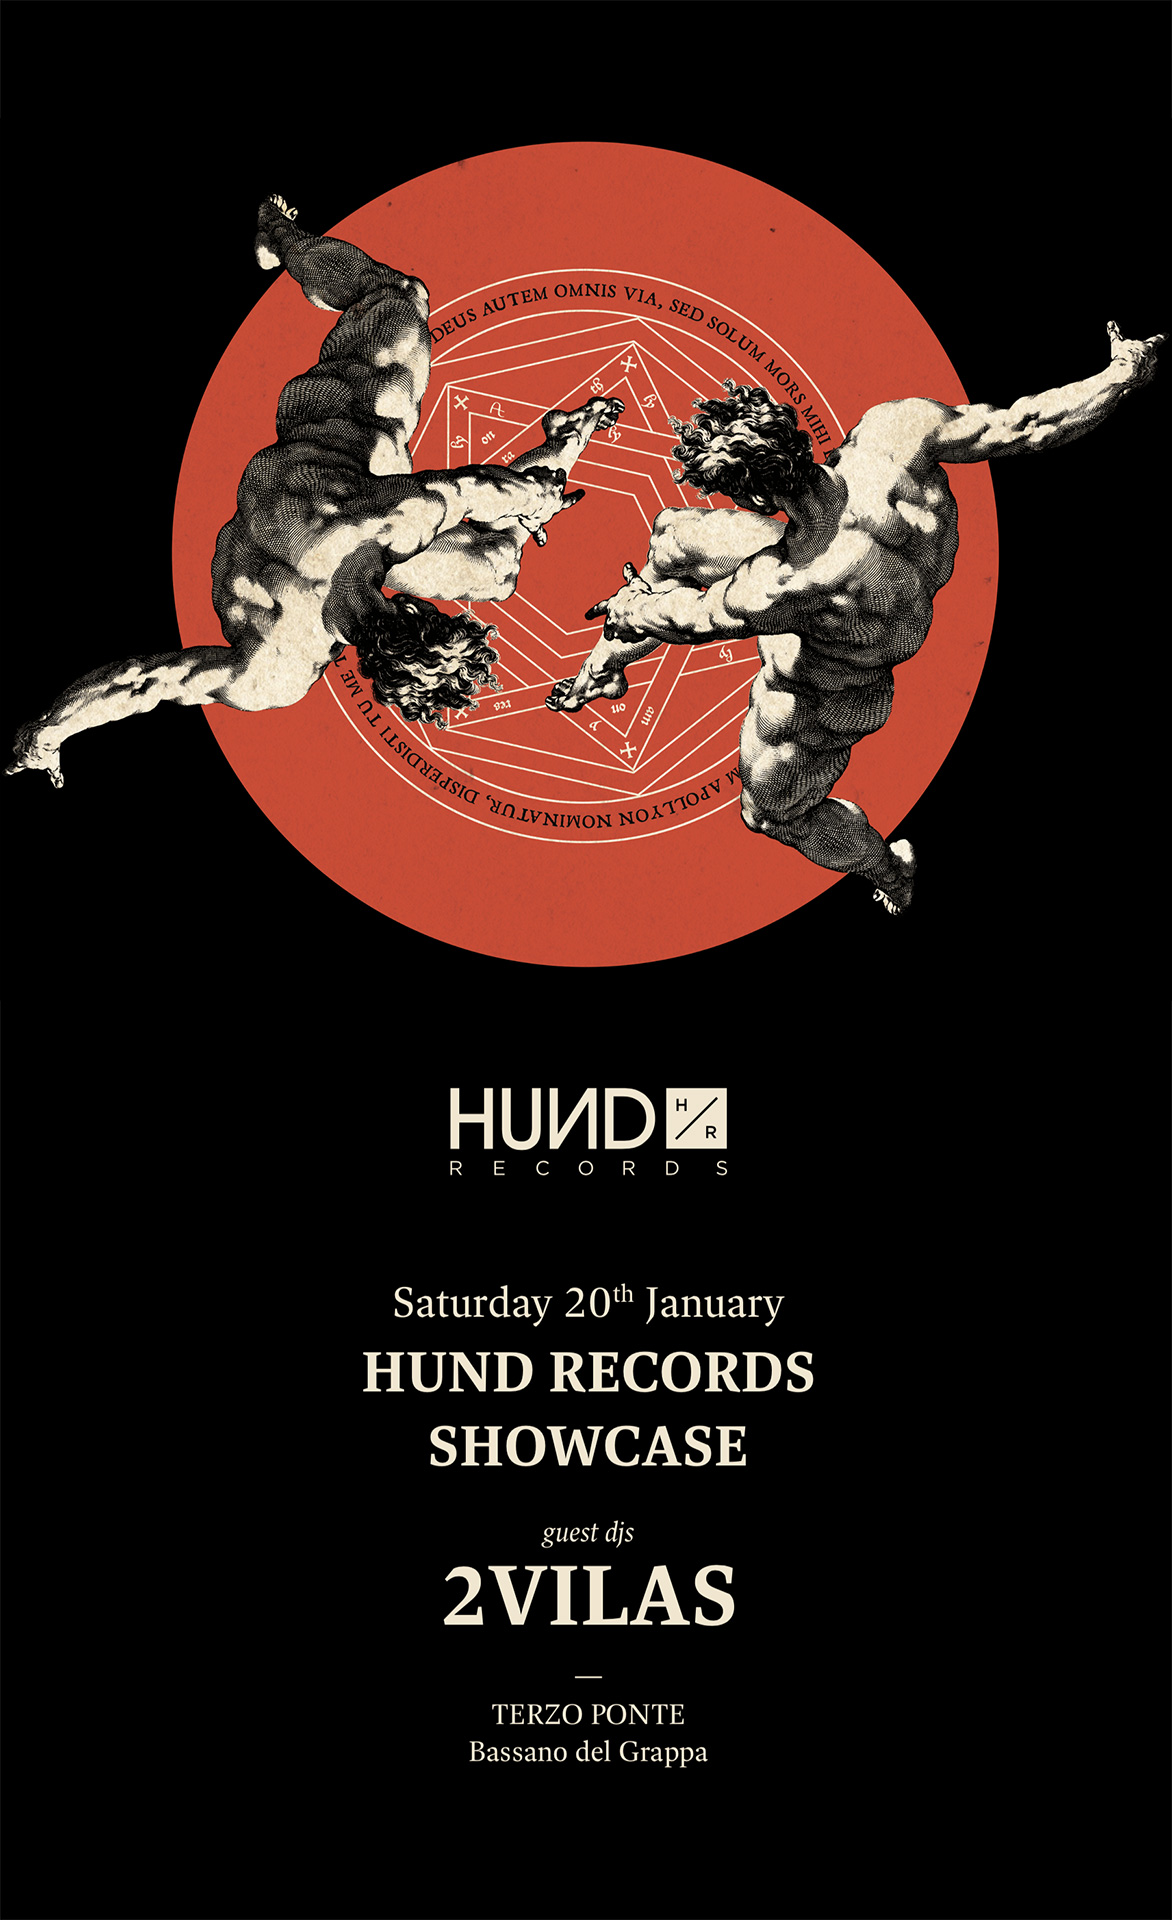 hund-records-showcase-2vilas-mob